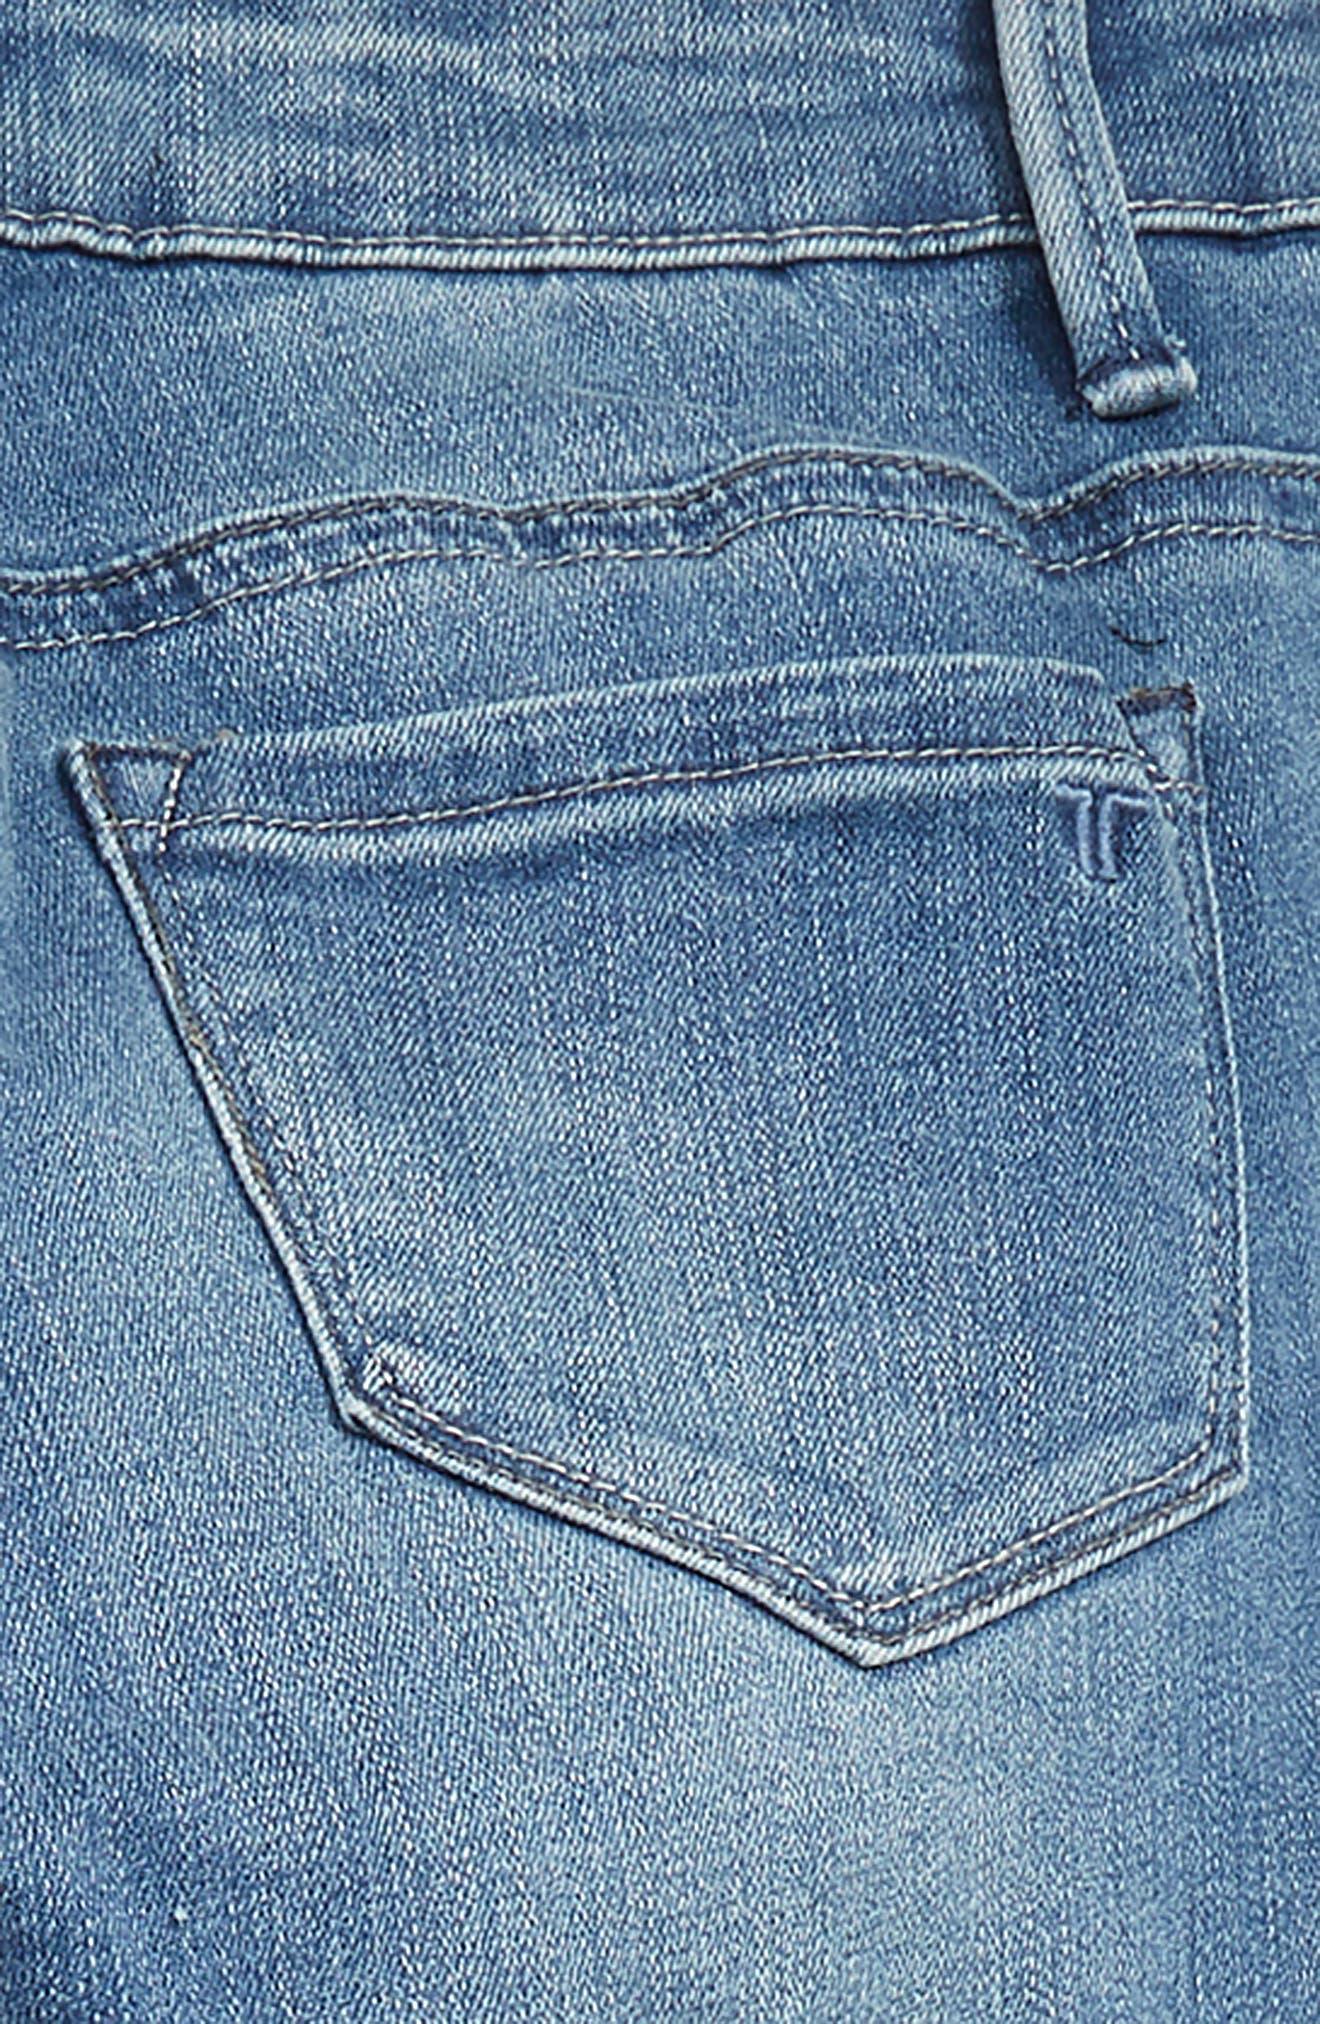 TRACTR,                             Deconstructed Eyelet Hem Skinny Jeans,                             Alternate thumbnail 3, color,                             407